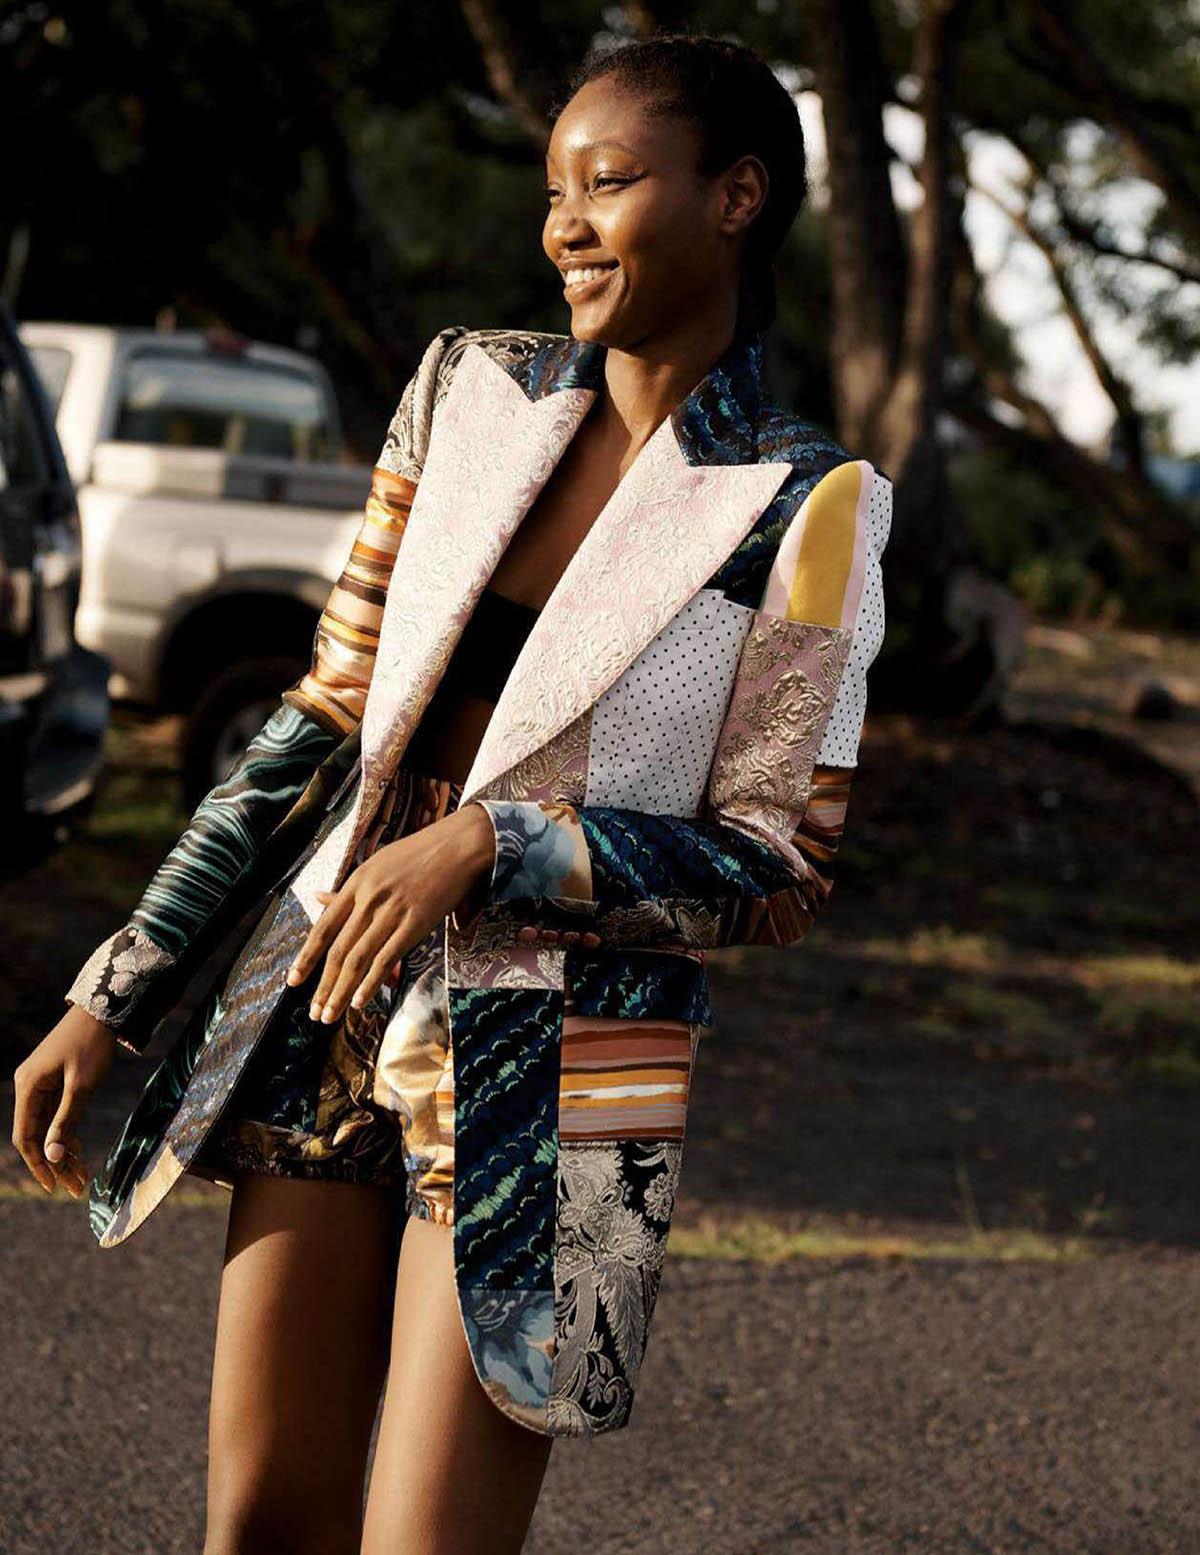 Eniola Abioro by Bridget Fleming for Vogue Mexico & Latin America April 2021